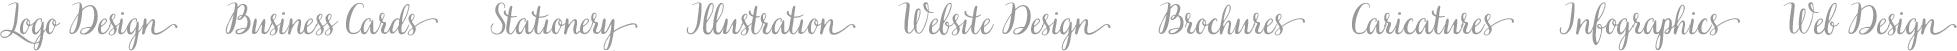 Logo Design, Business Cards, Stationary, Illustration, Website Design, Brochures, Infographics Design in San Francisco, California by Kimberly Schwede